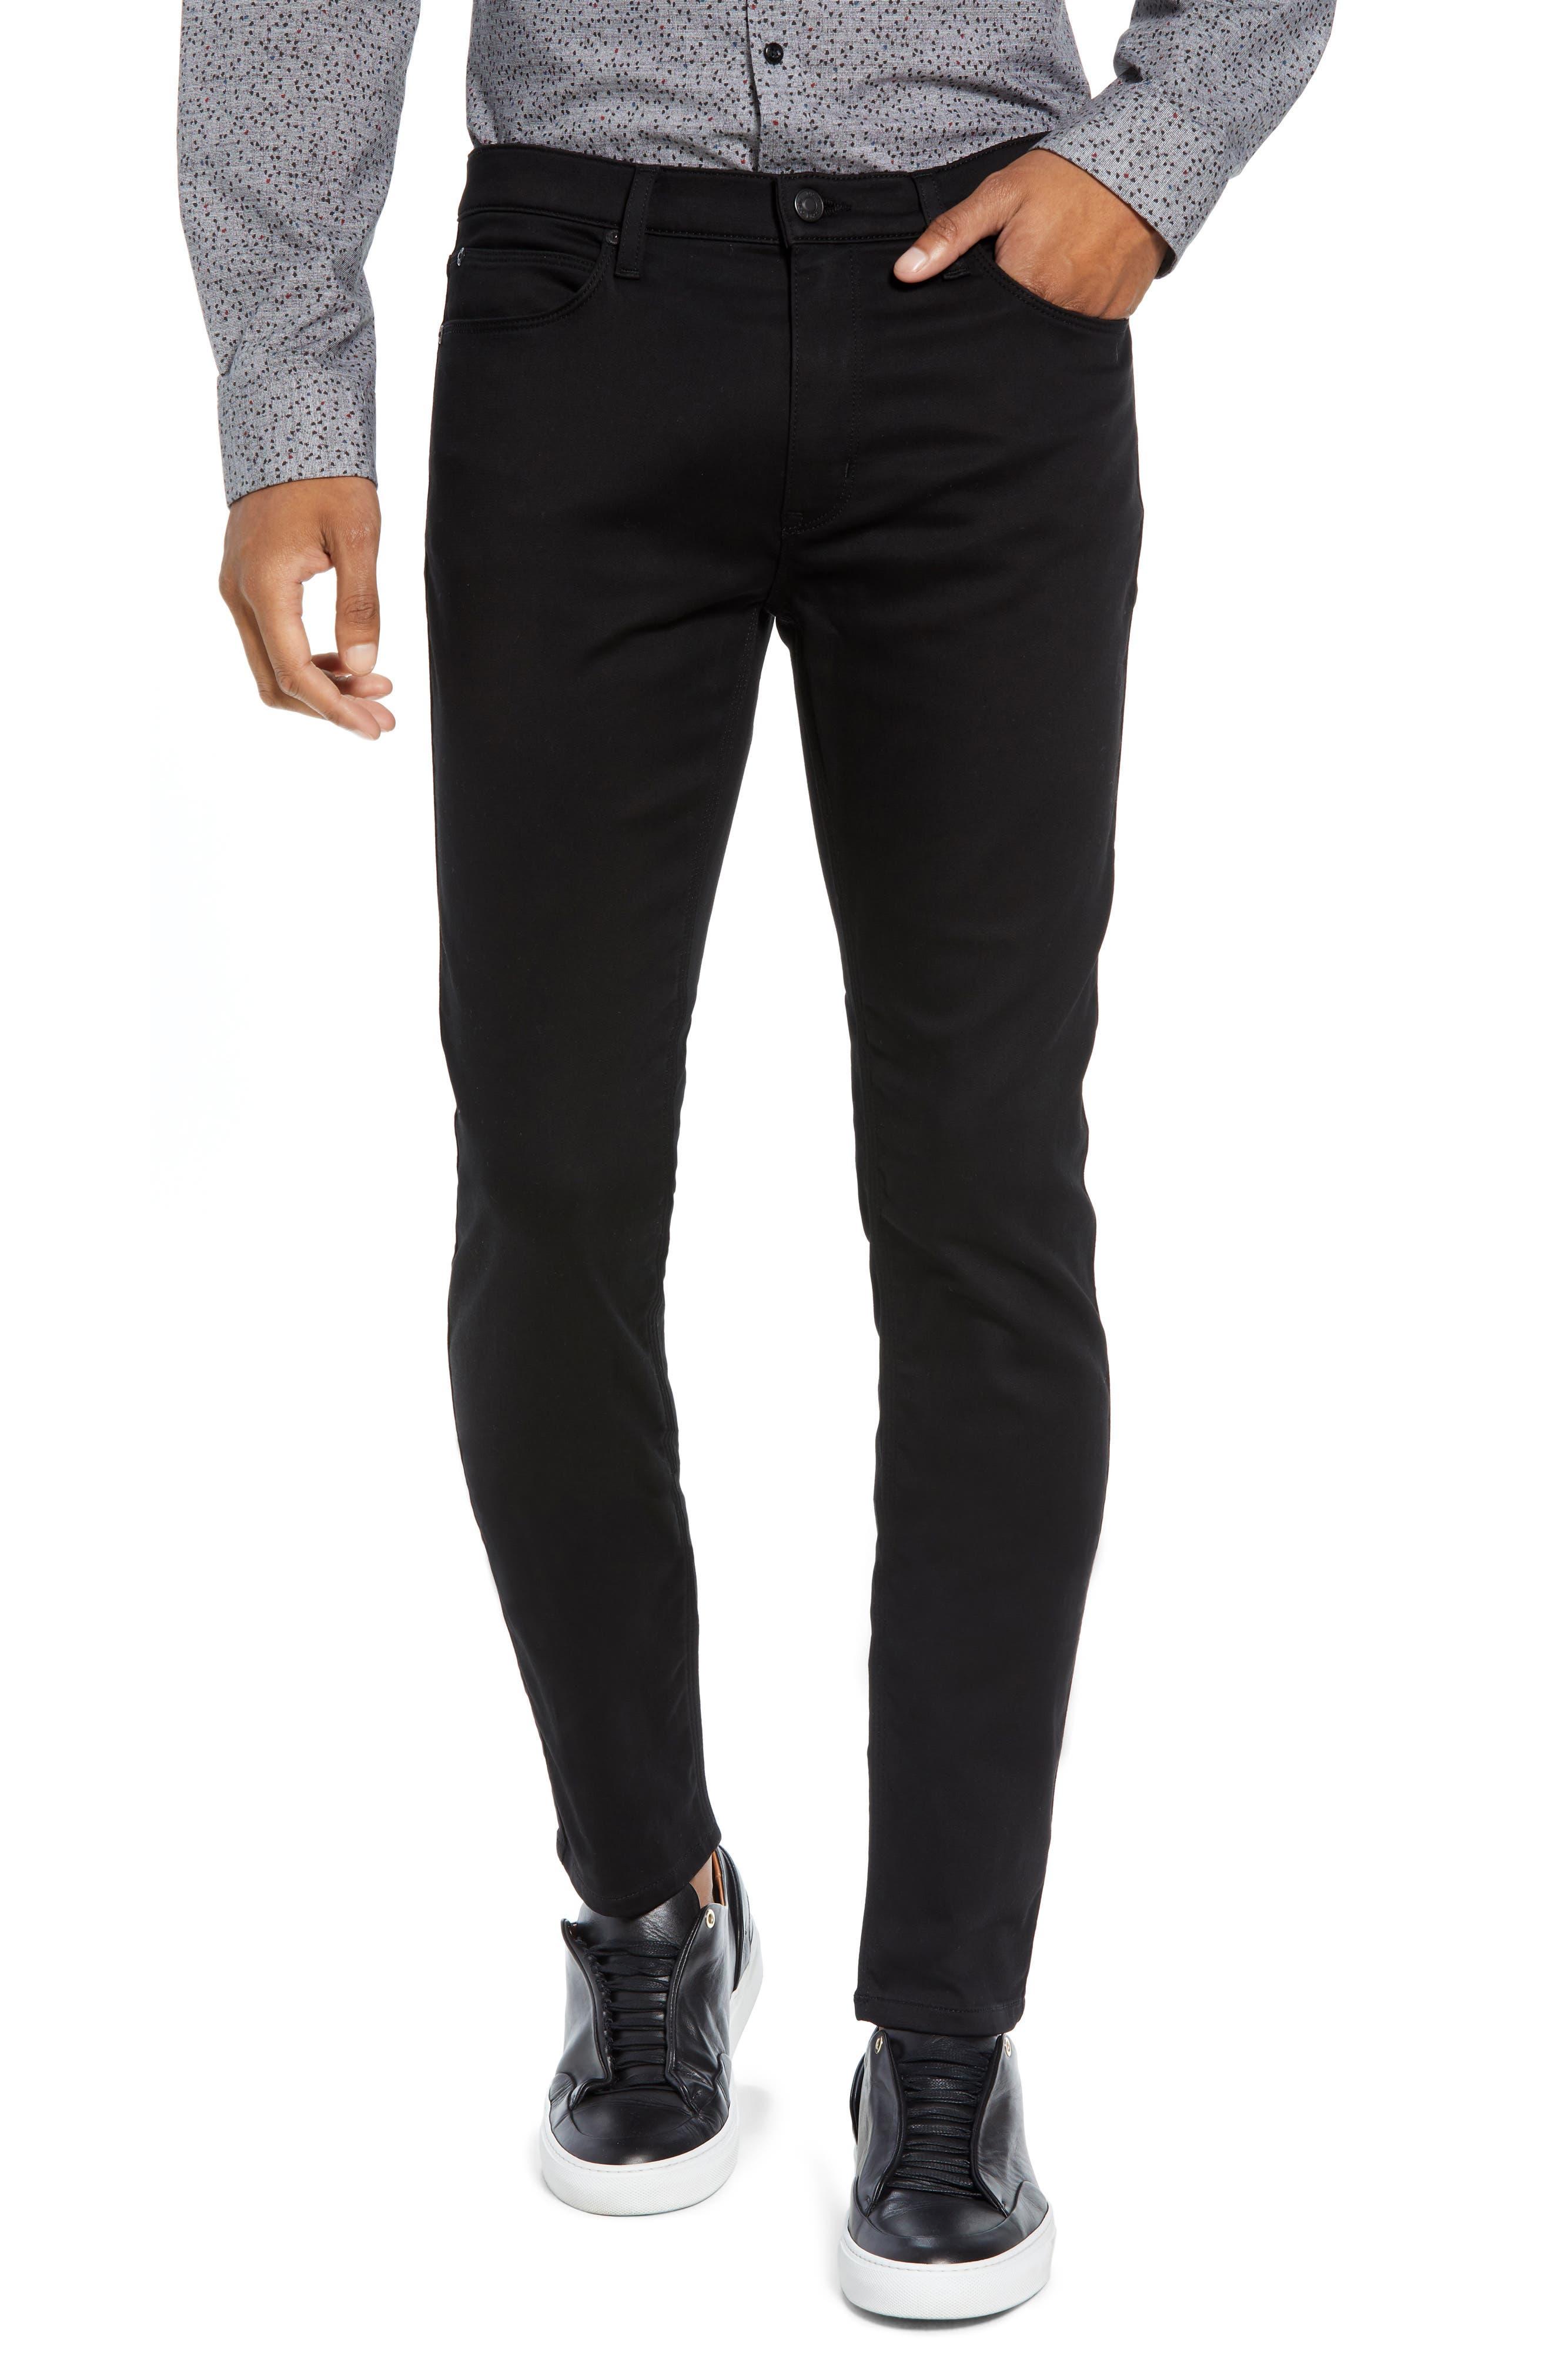 734 Skinny Fit Jeans,                         Main,                         color, BLACK